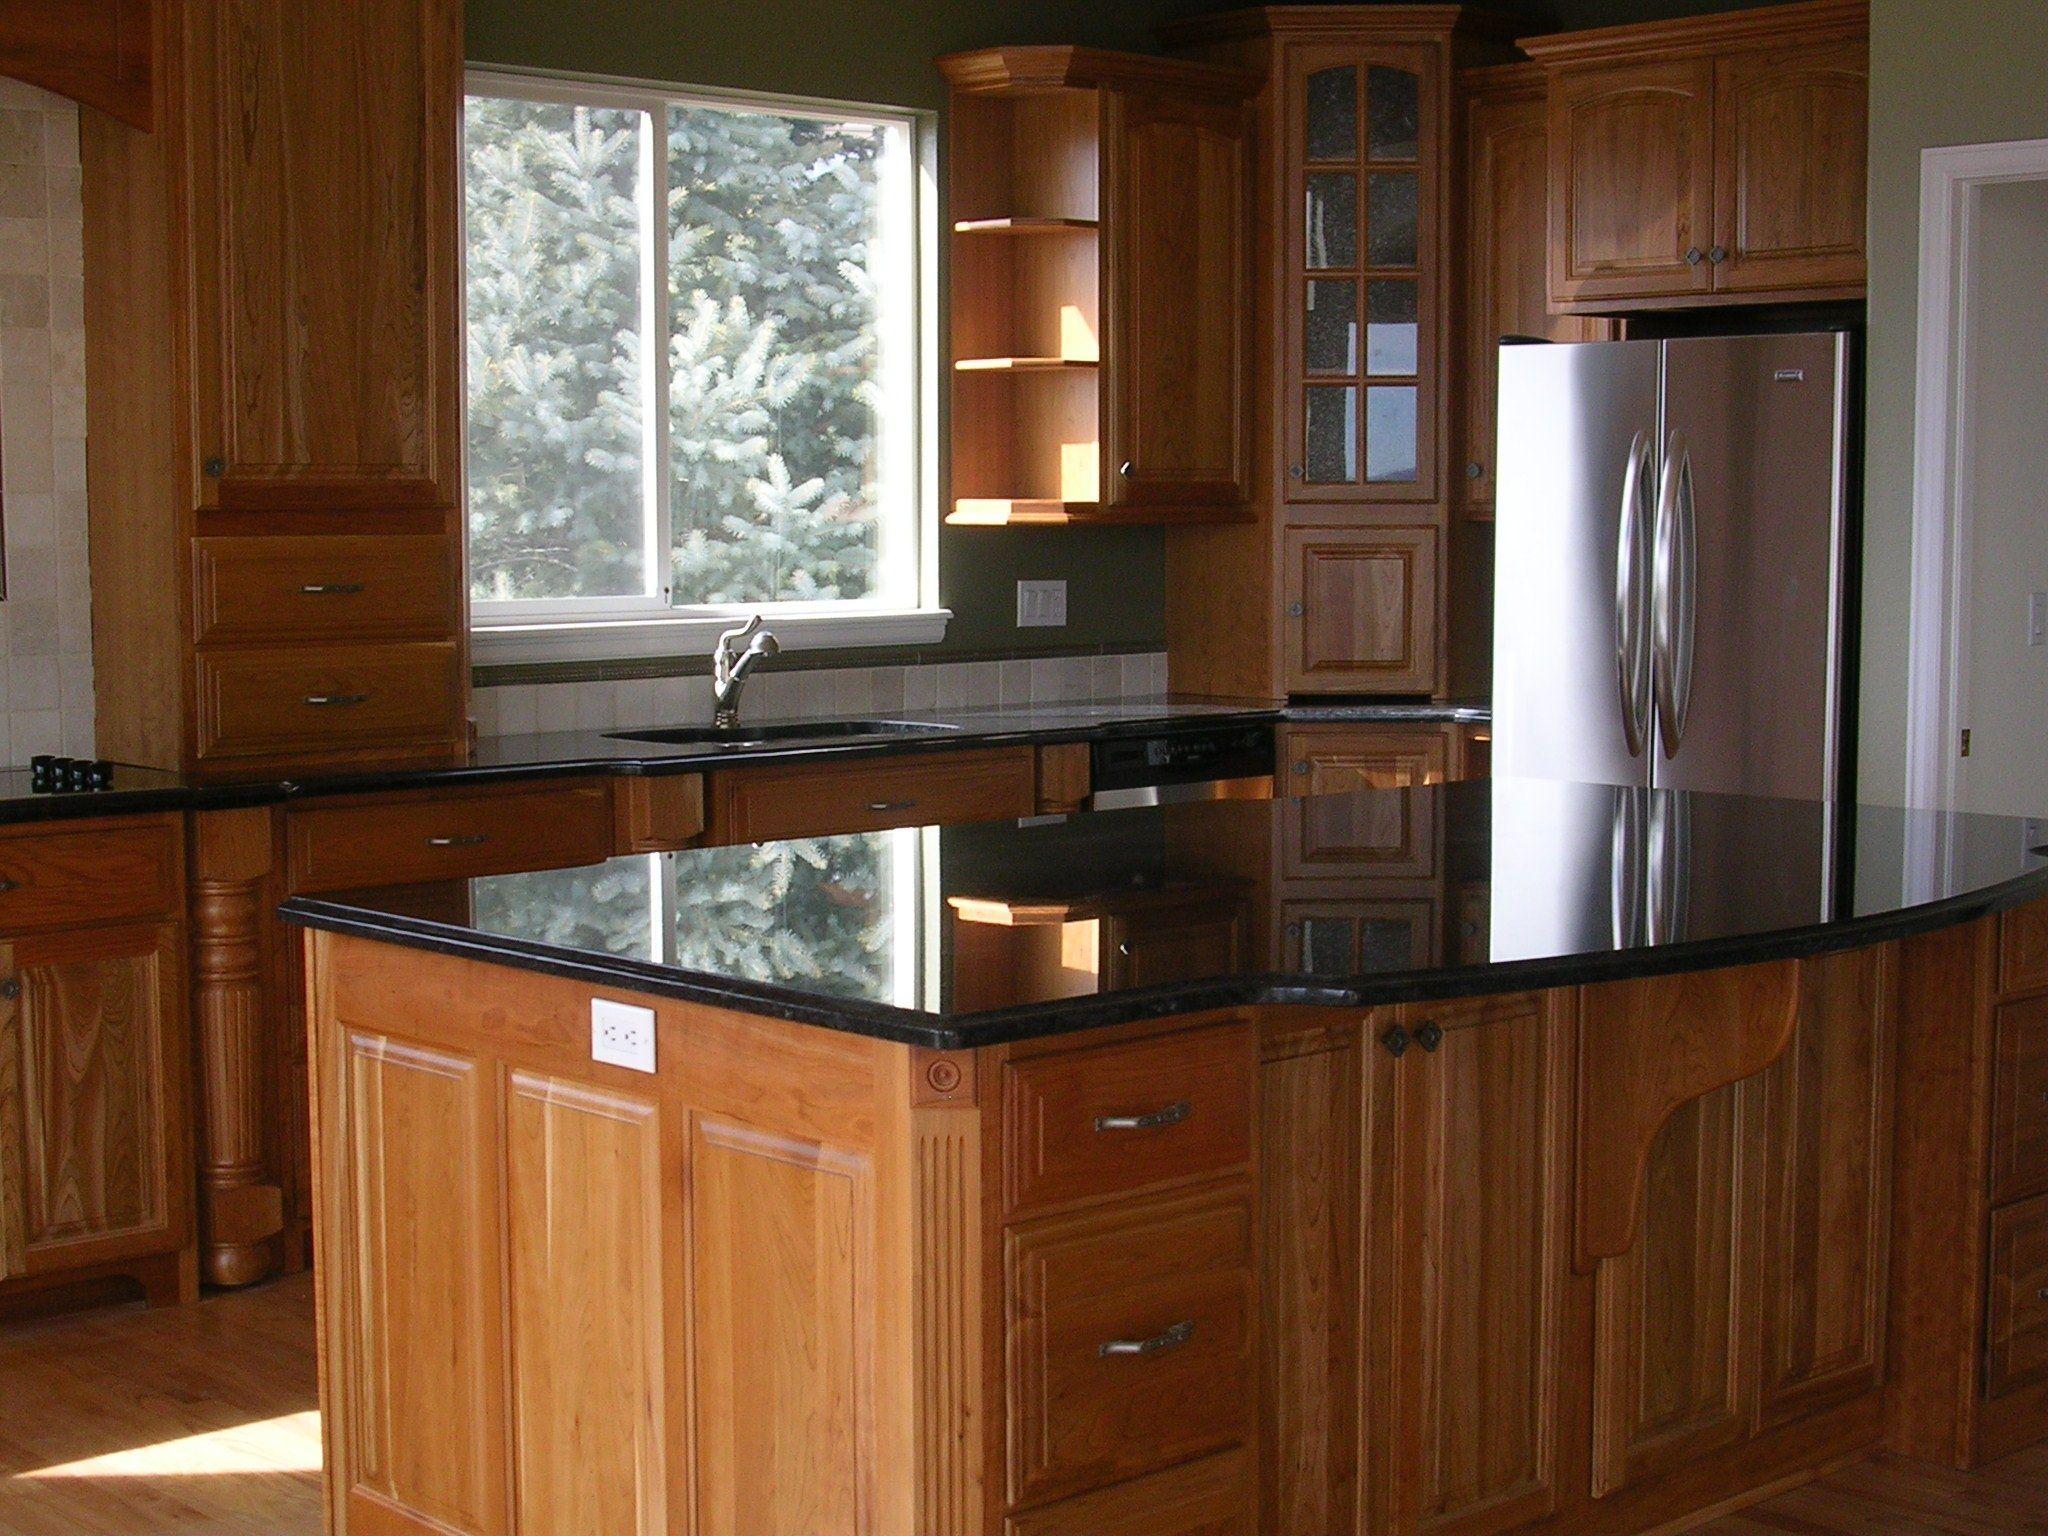 Cherry Amish Cabinets Of Denver Kitchen Cabinet Design Kitchen Design Amish Kitchen Cabinets